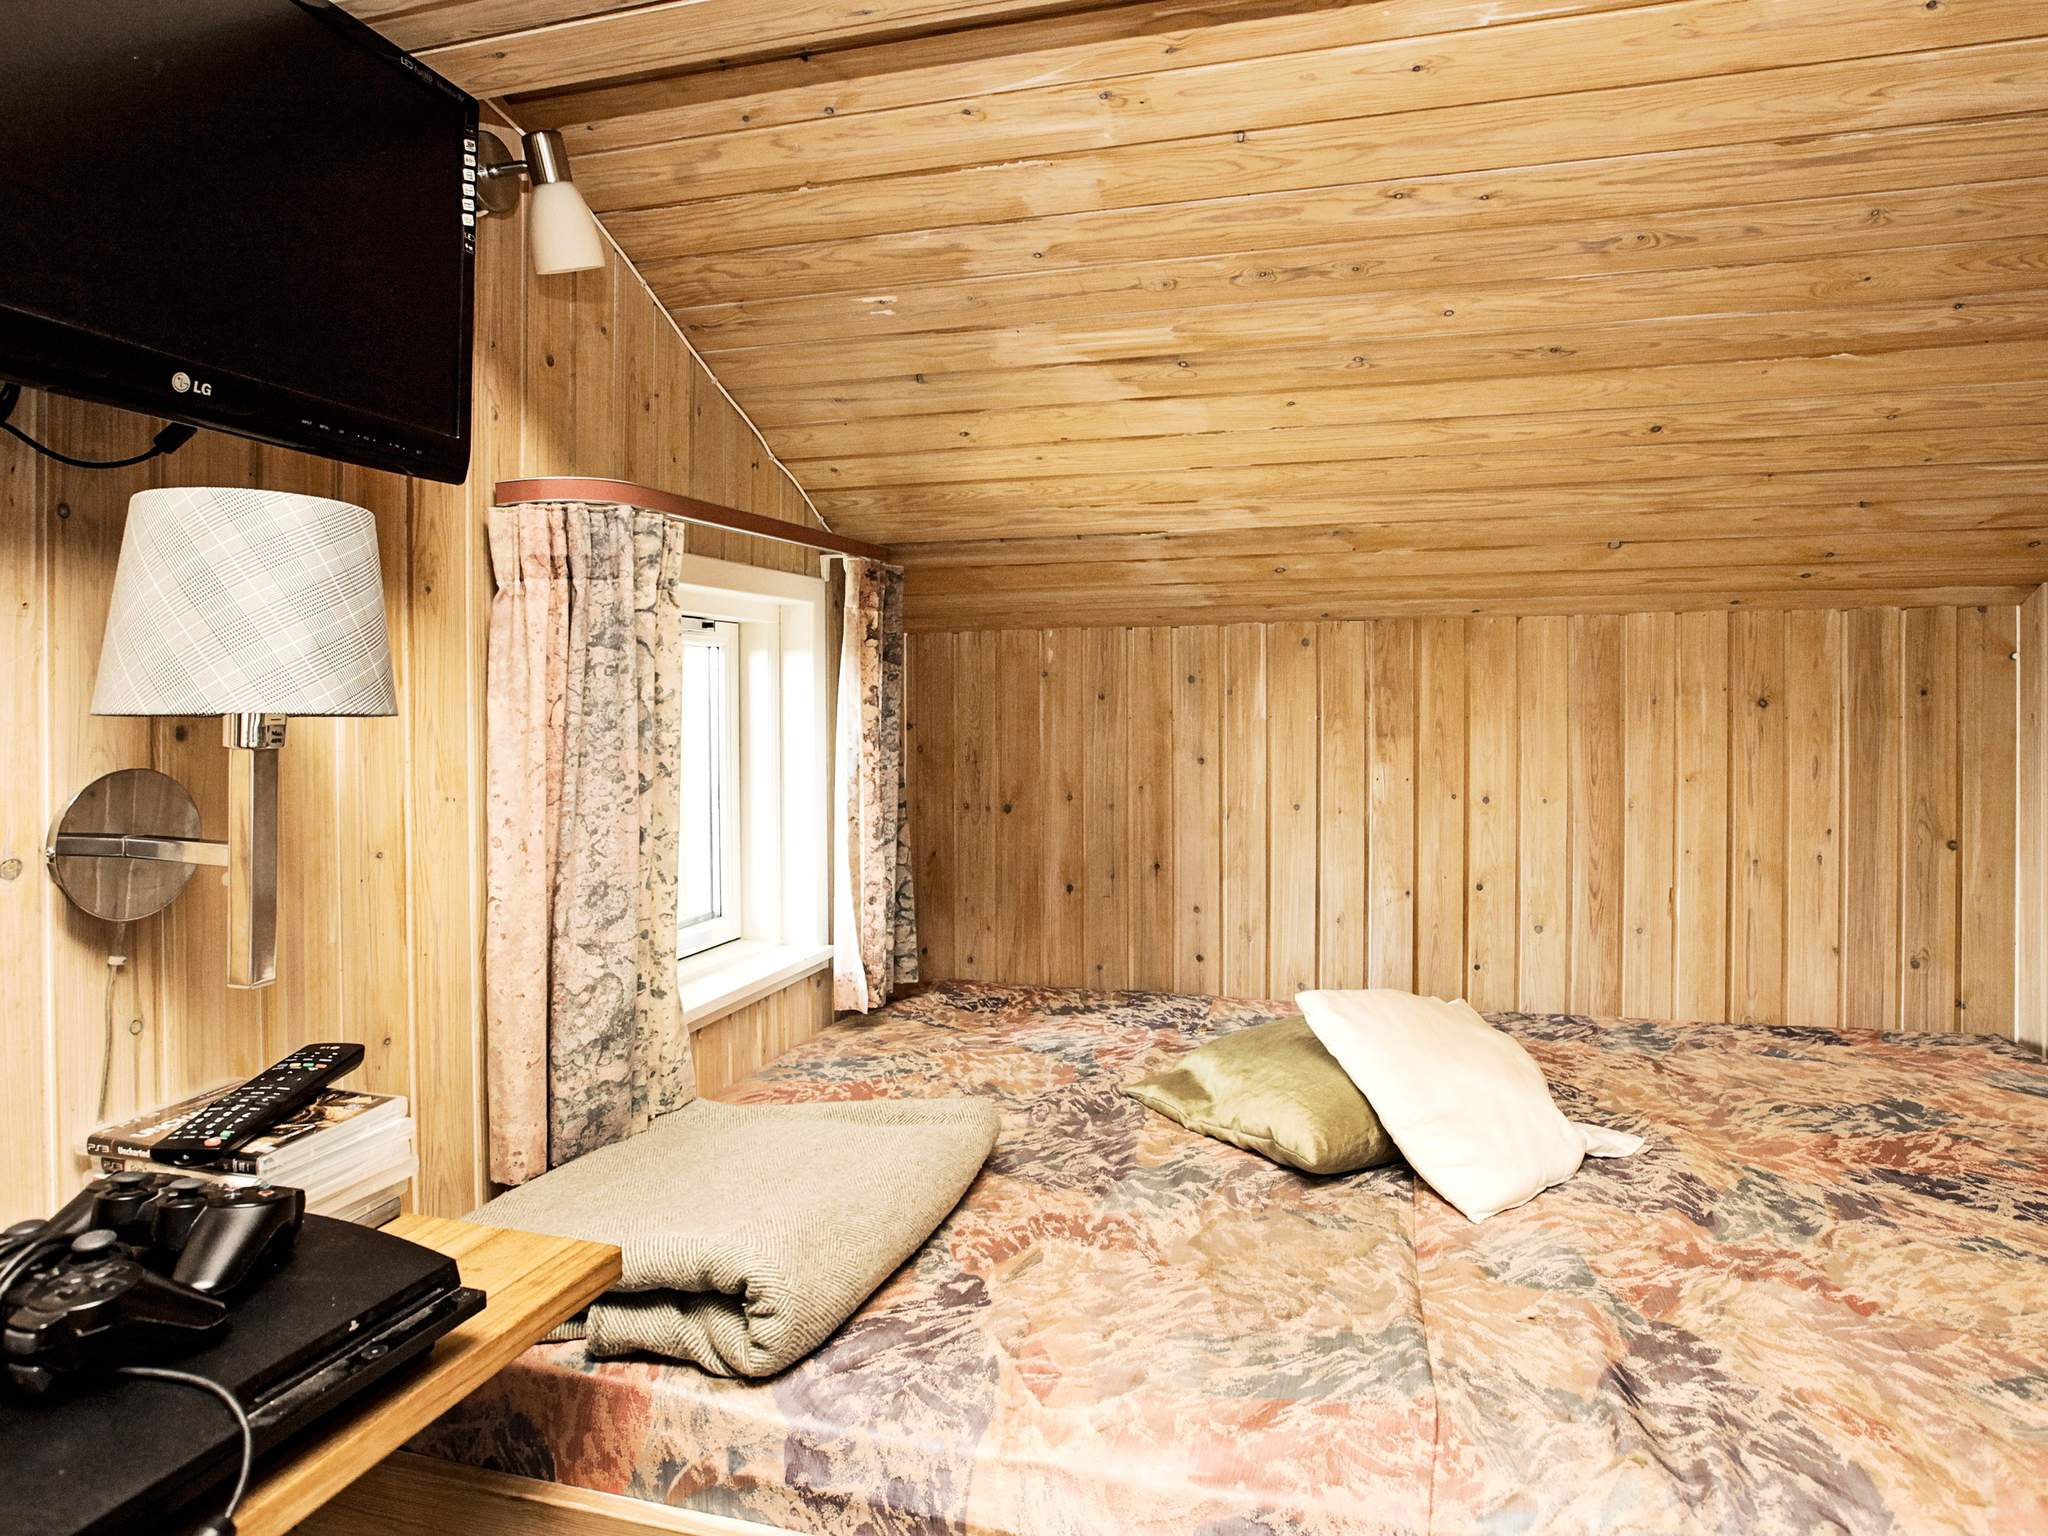 Maison de vacances Falsled (87545), Faldsled, , Fionie, Danemark, image 14